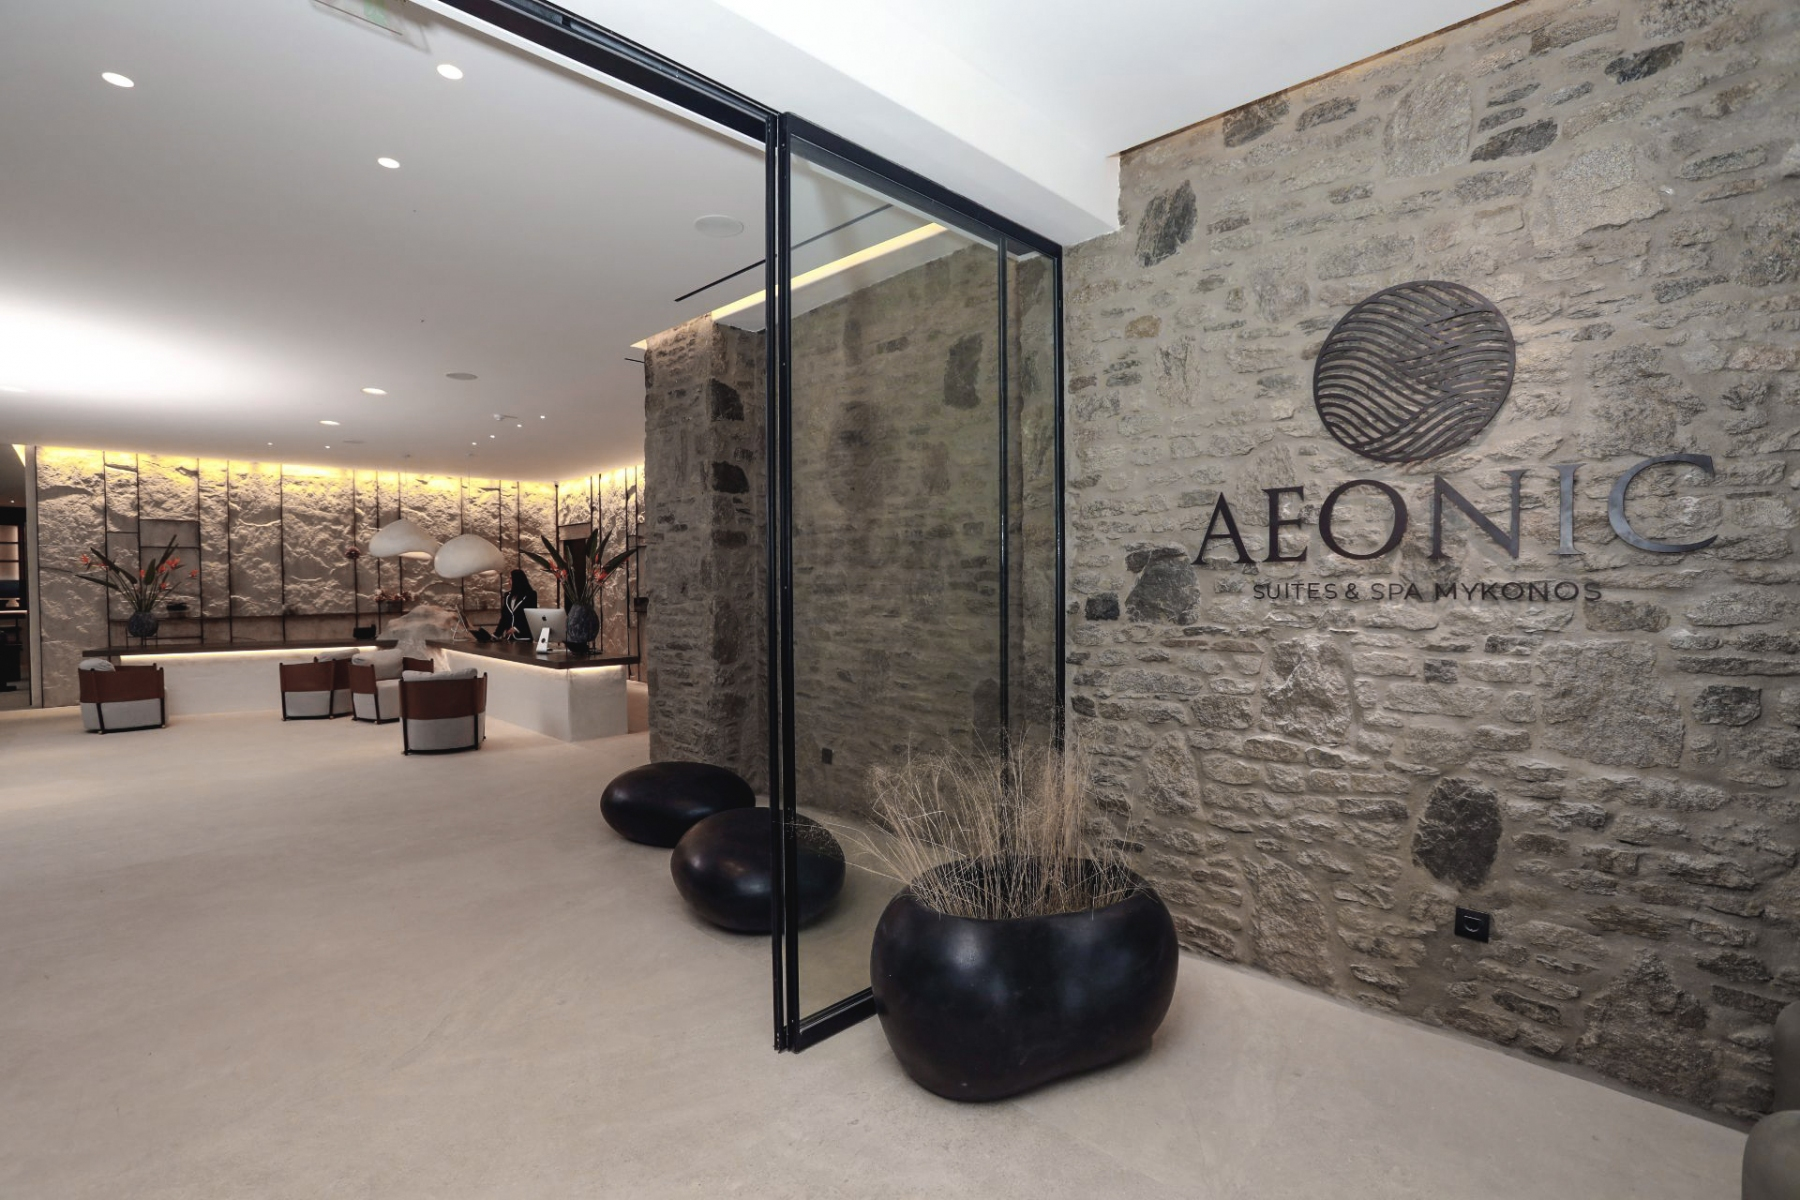 1_Hall-Aeonic-Suites-Spa-Interior-5